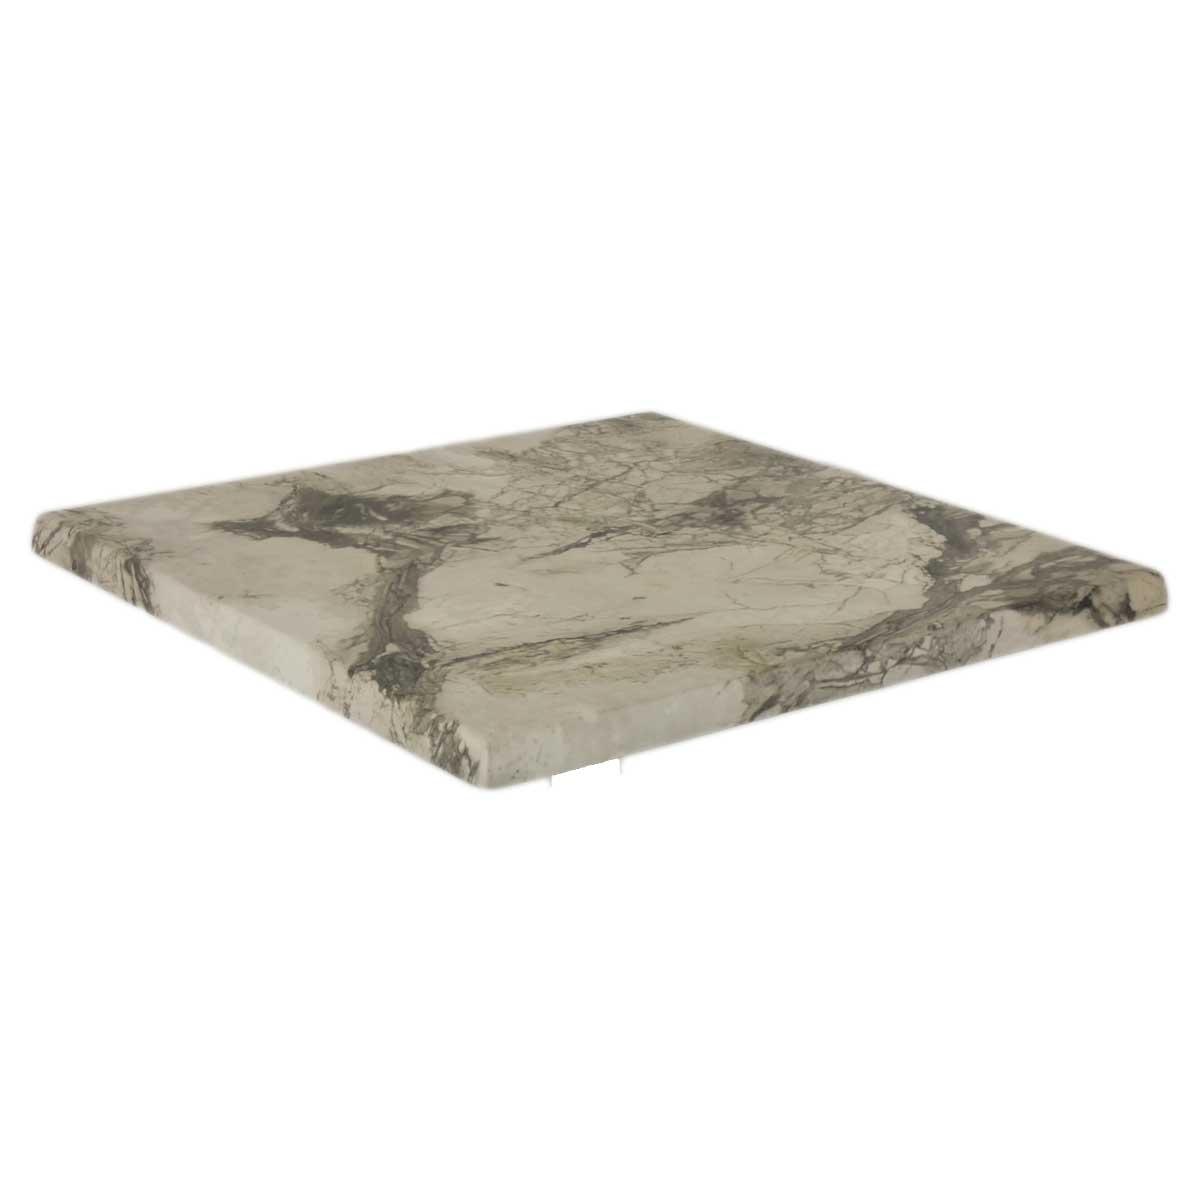 TICLA Q70 209 - https://www.werzalit.com/nl/product/tafelblad-classic-werzalit-q-70x70-209-marmor-almeria/